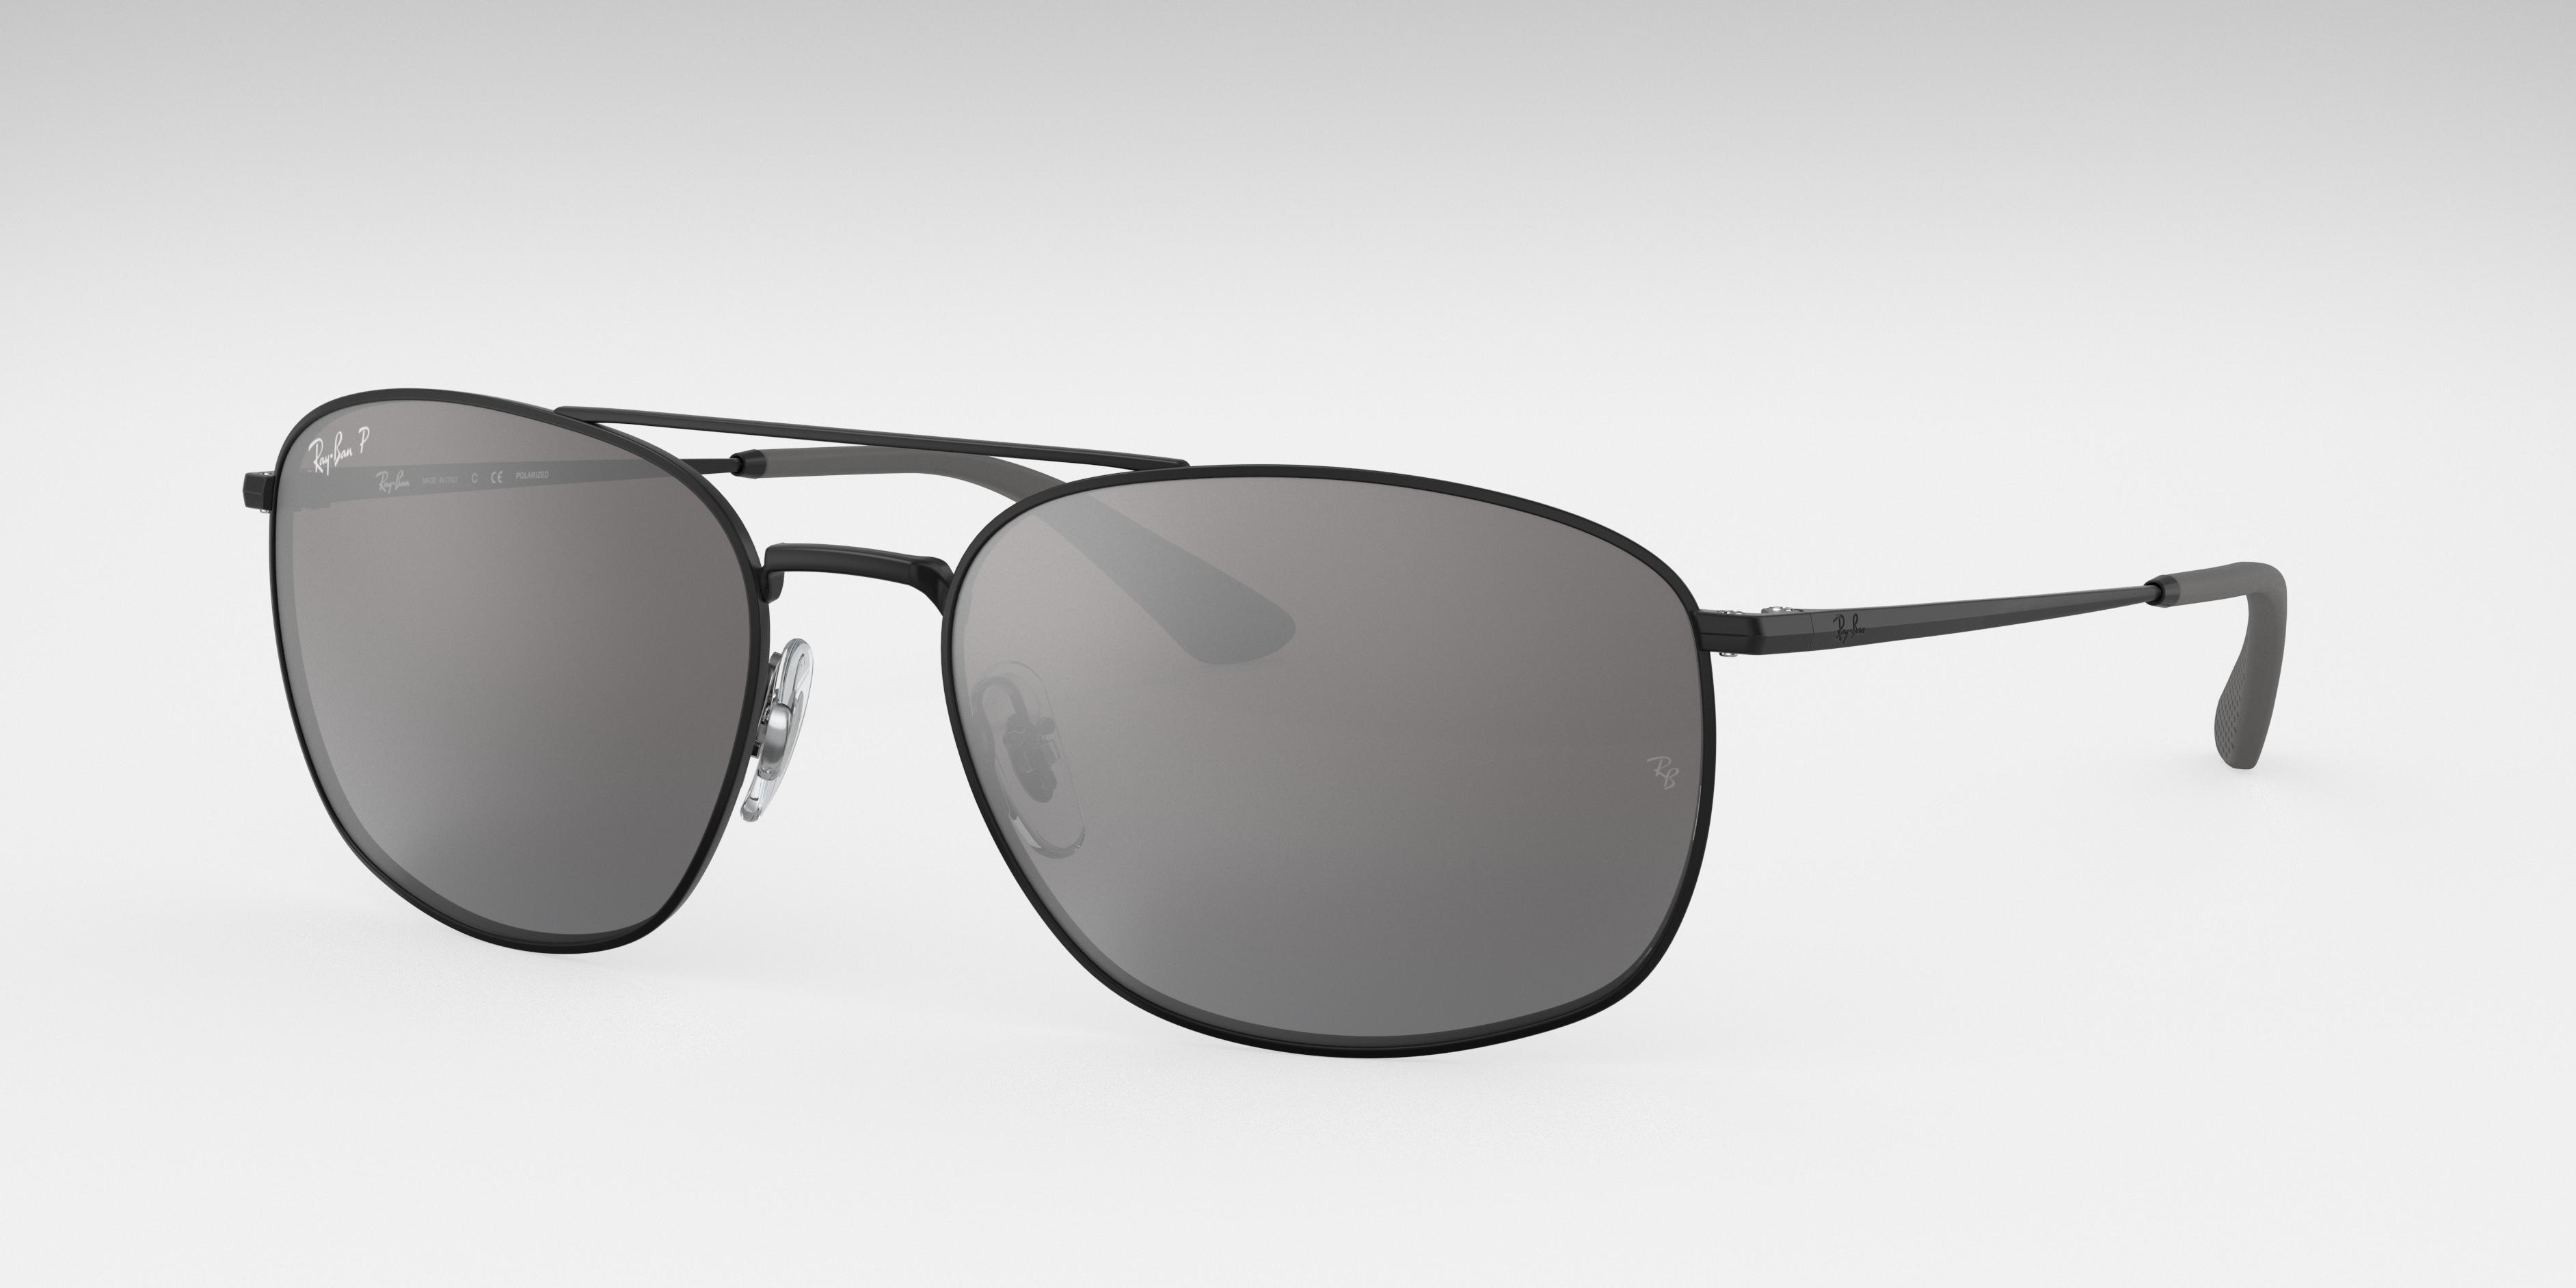 Ray-Ban Rb3654 Black, Polarized Grey Lenses - RB3654